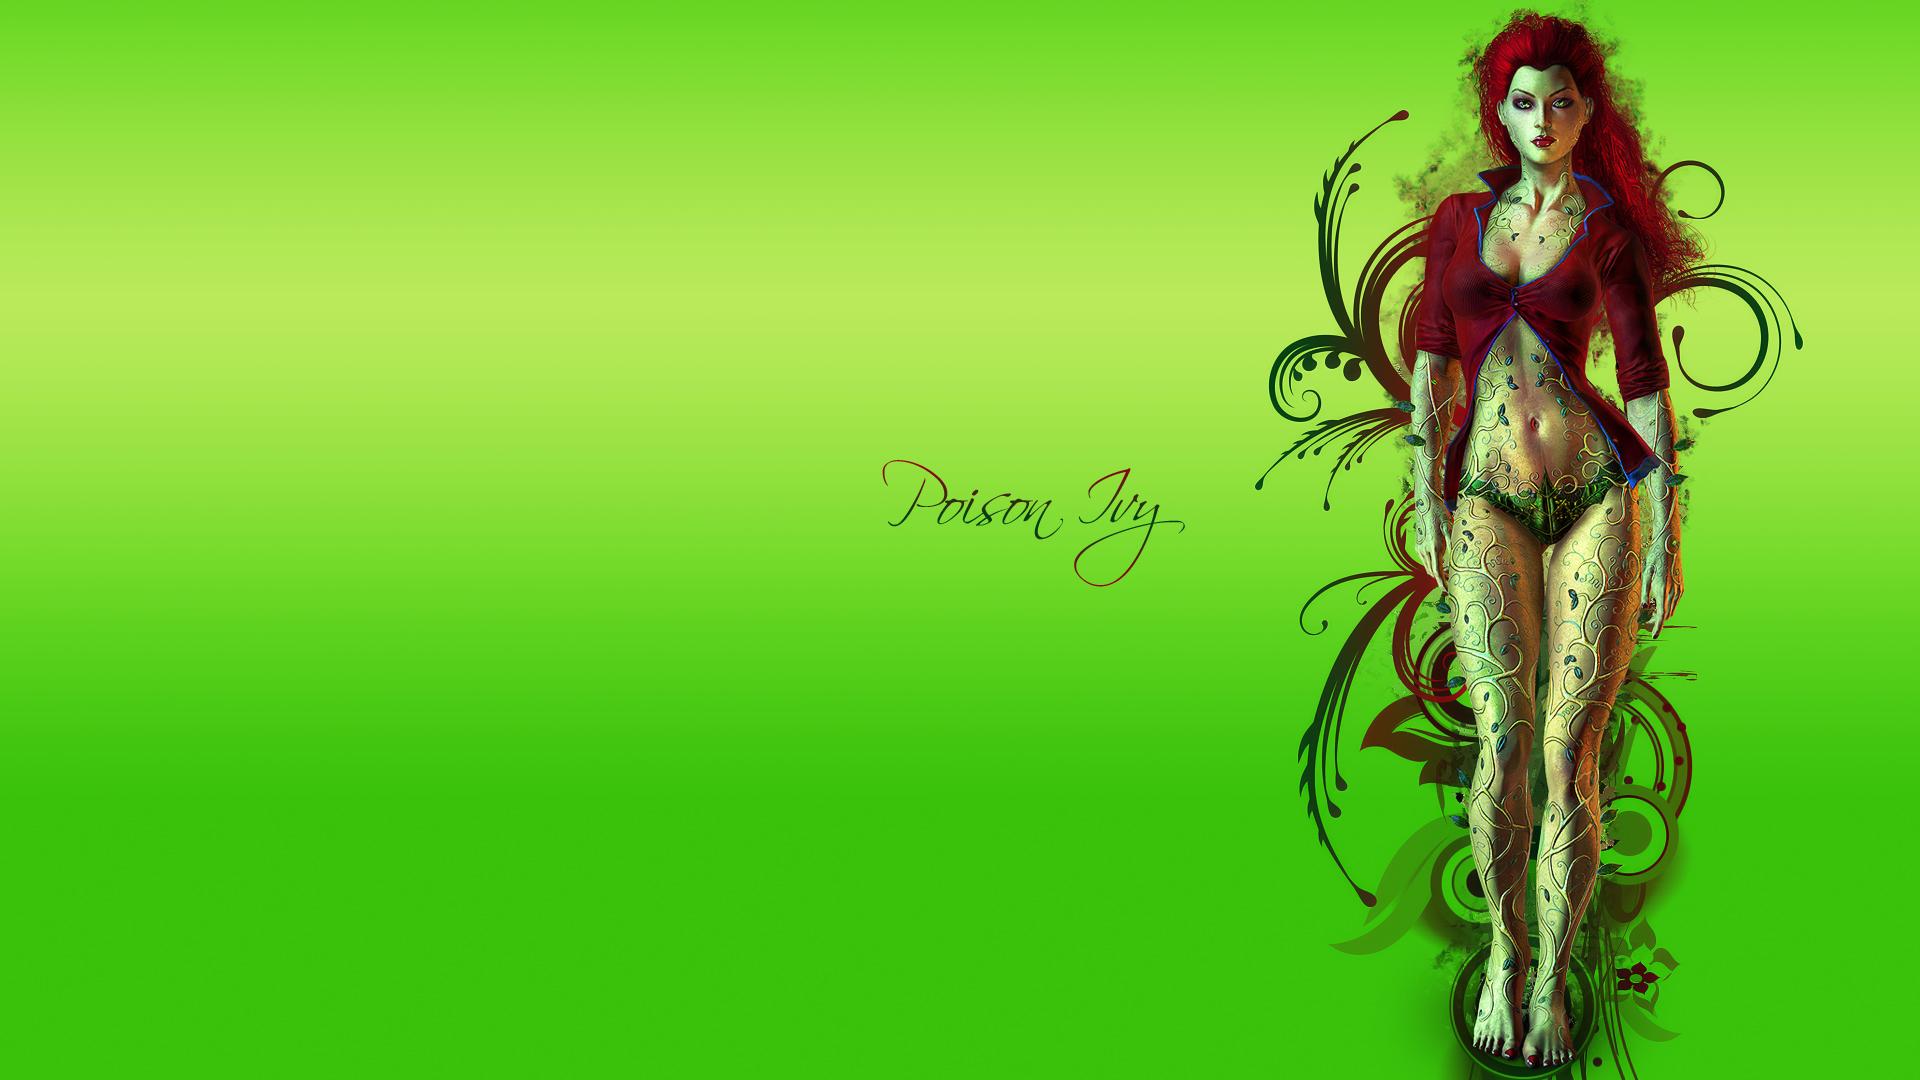 Sexy Poison Ivy Wallpaper - Wallpapersafari-3427